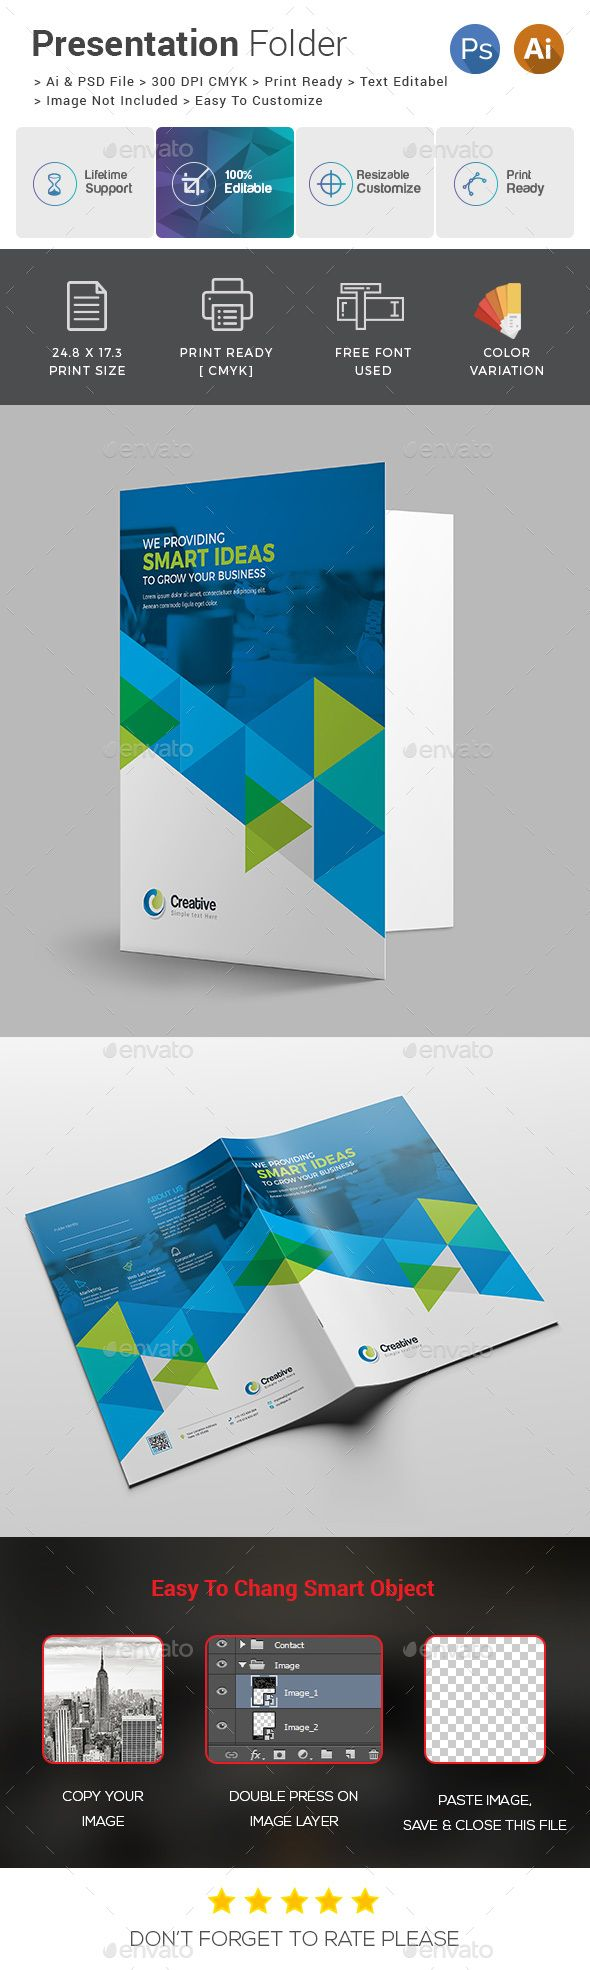 Presentation Folder | Carpetas corporativas y Carpeta